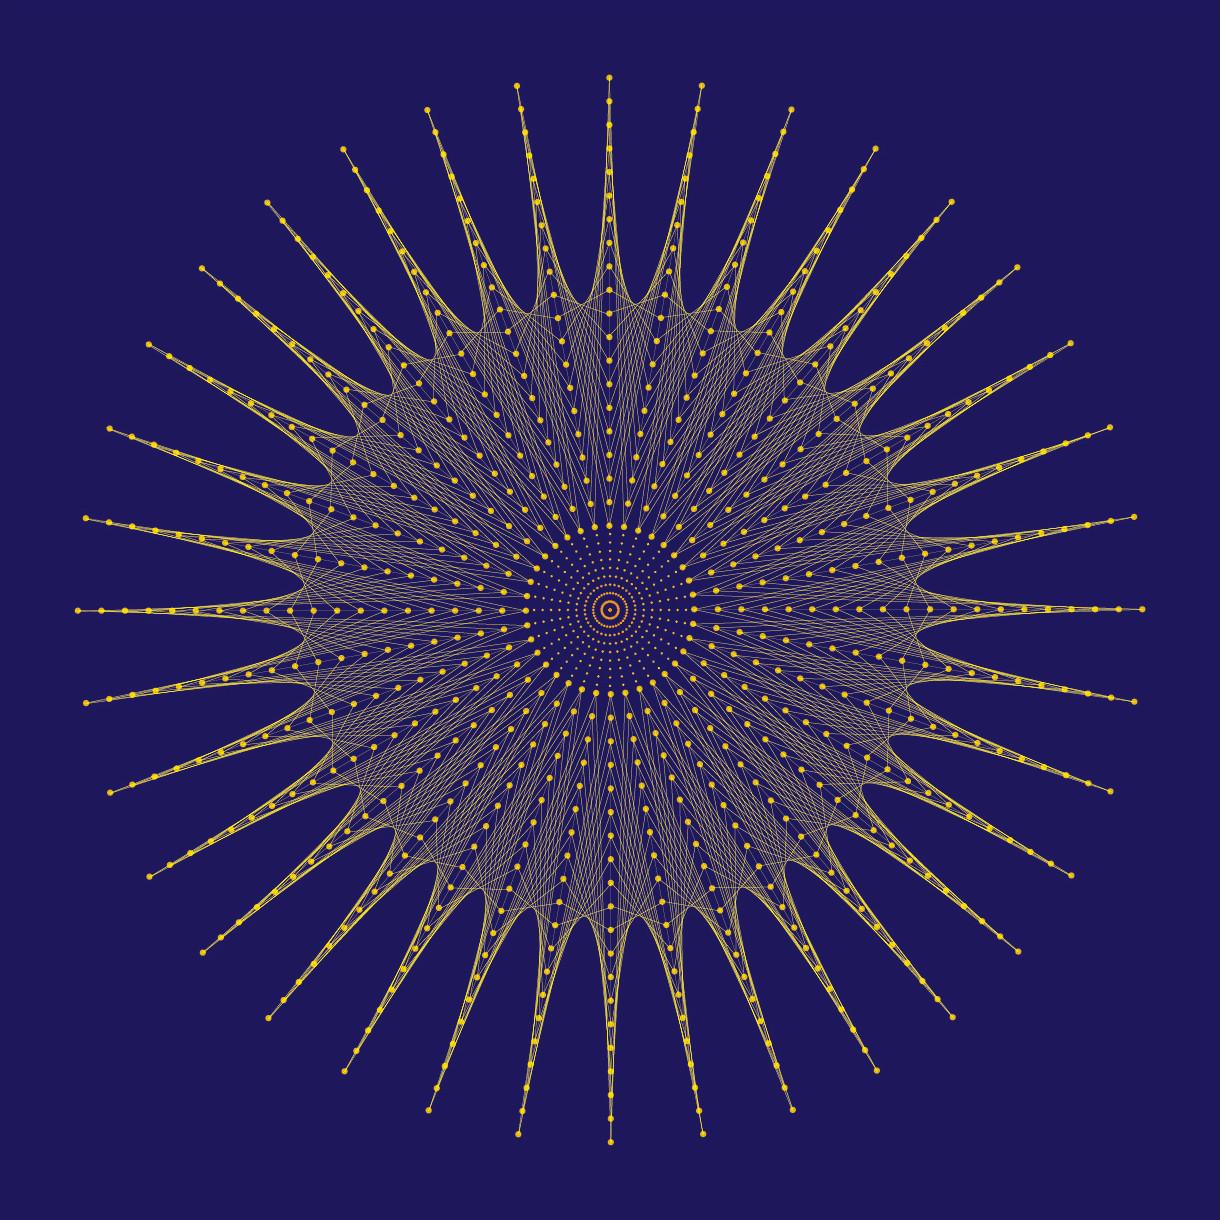 Rajesh sawant string art 01